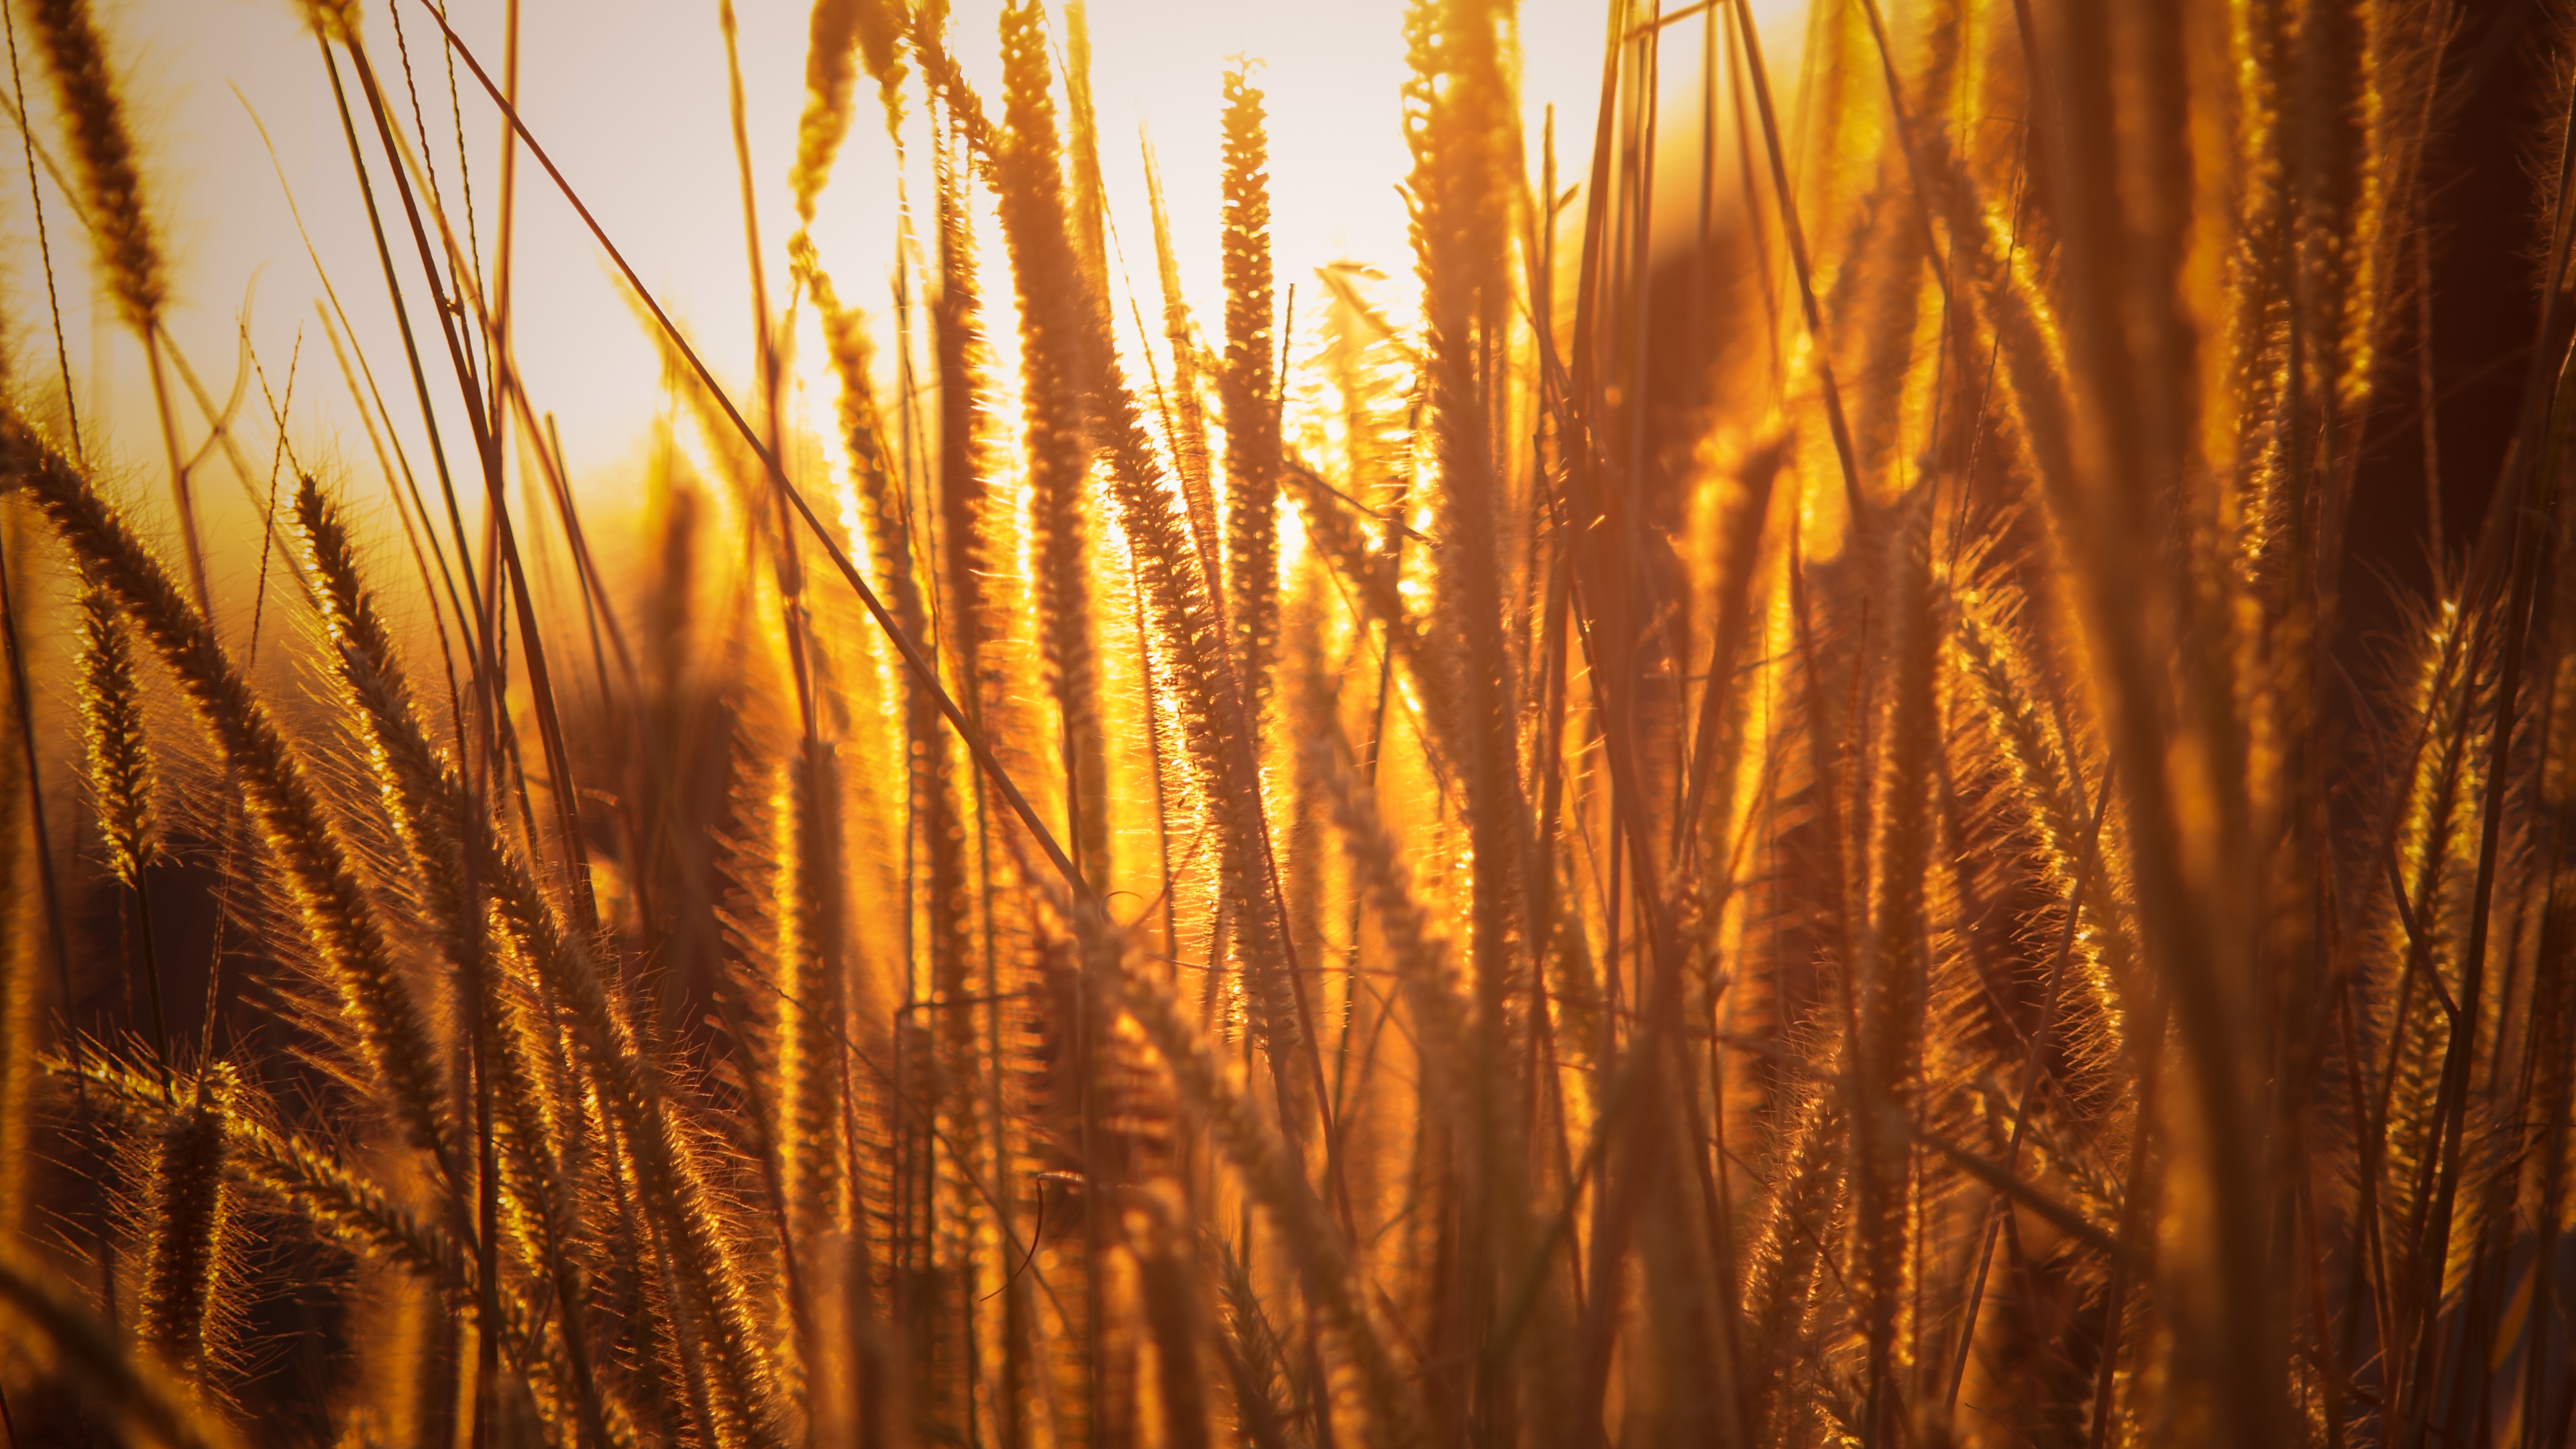 rice agriculture field golden hour grass 4k 1540136514 - Rice Agriculture Field Golden Hour Grass 4k - nature wallpapers, hd-wallpapers, grass wallpapers, field wallpapers, 5k wallpapers, 4k-wallpapers